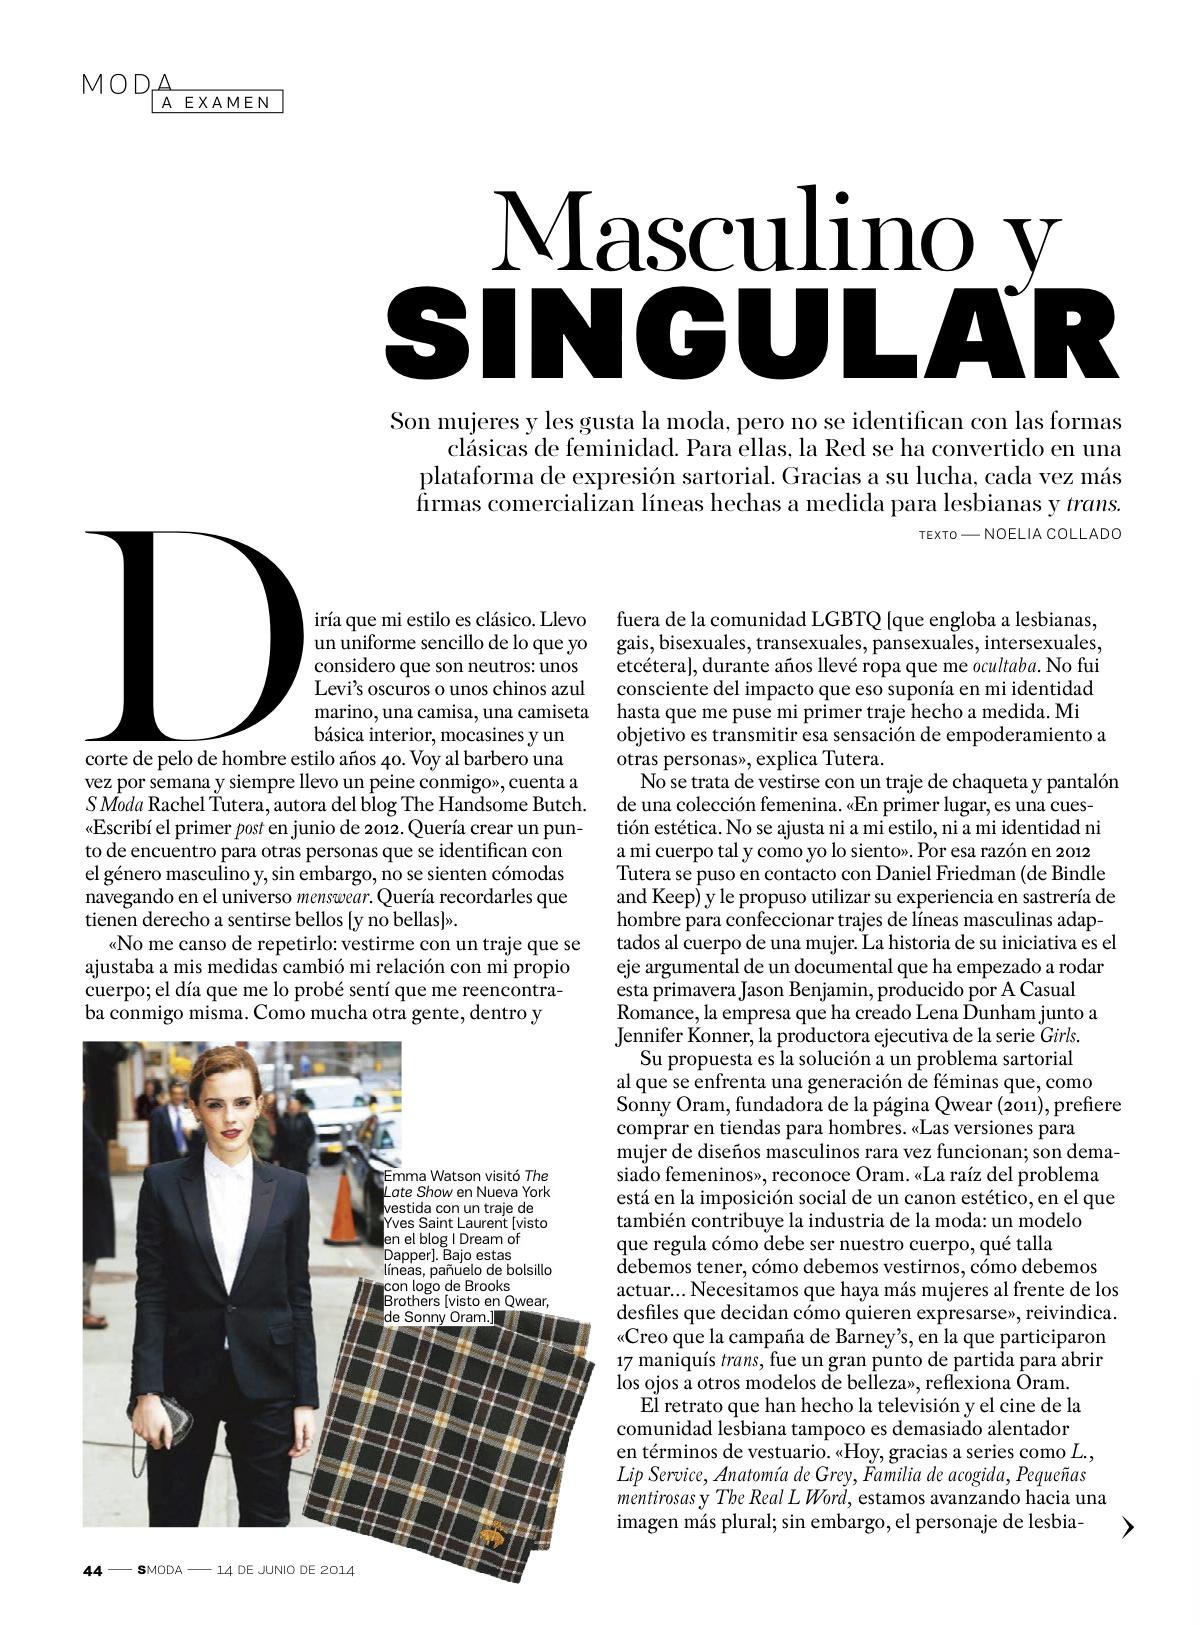 S Moda Page 1.jpg